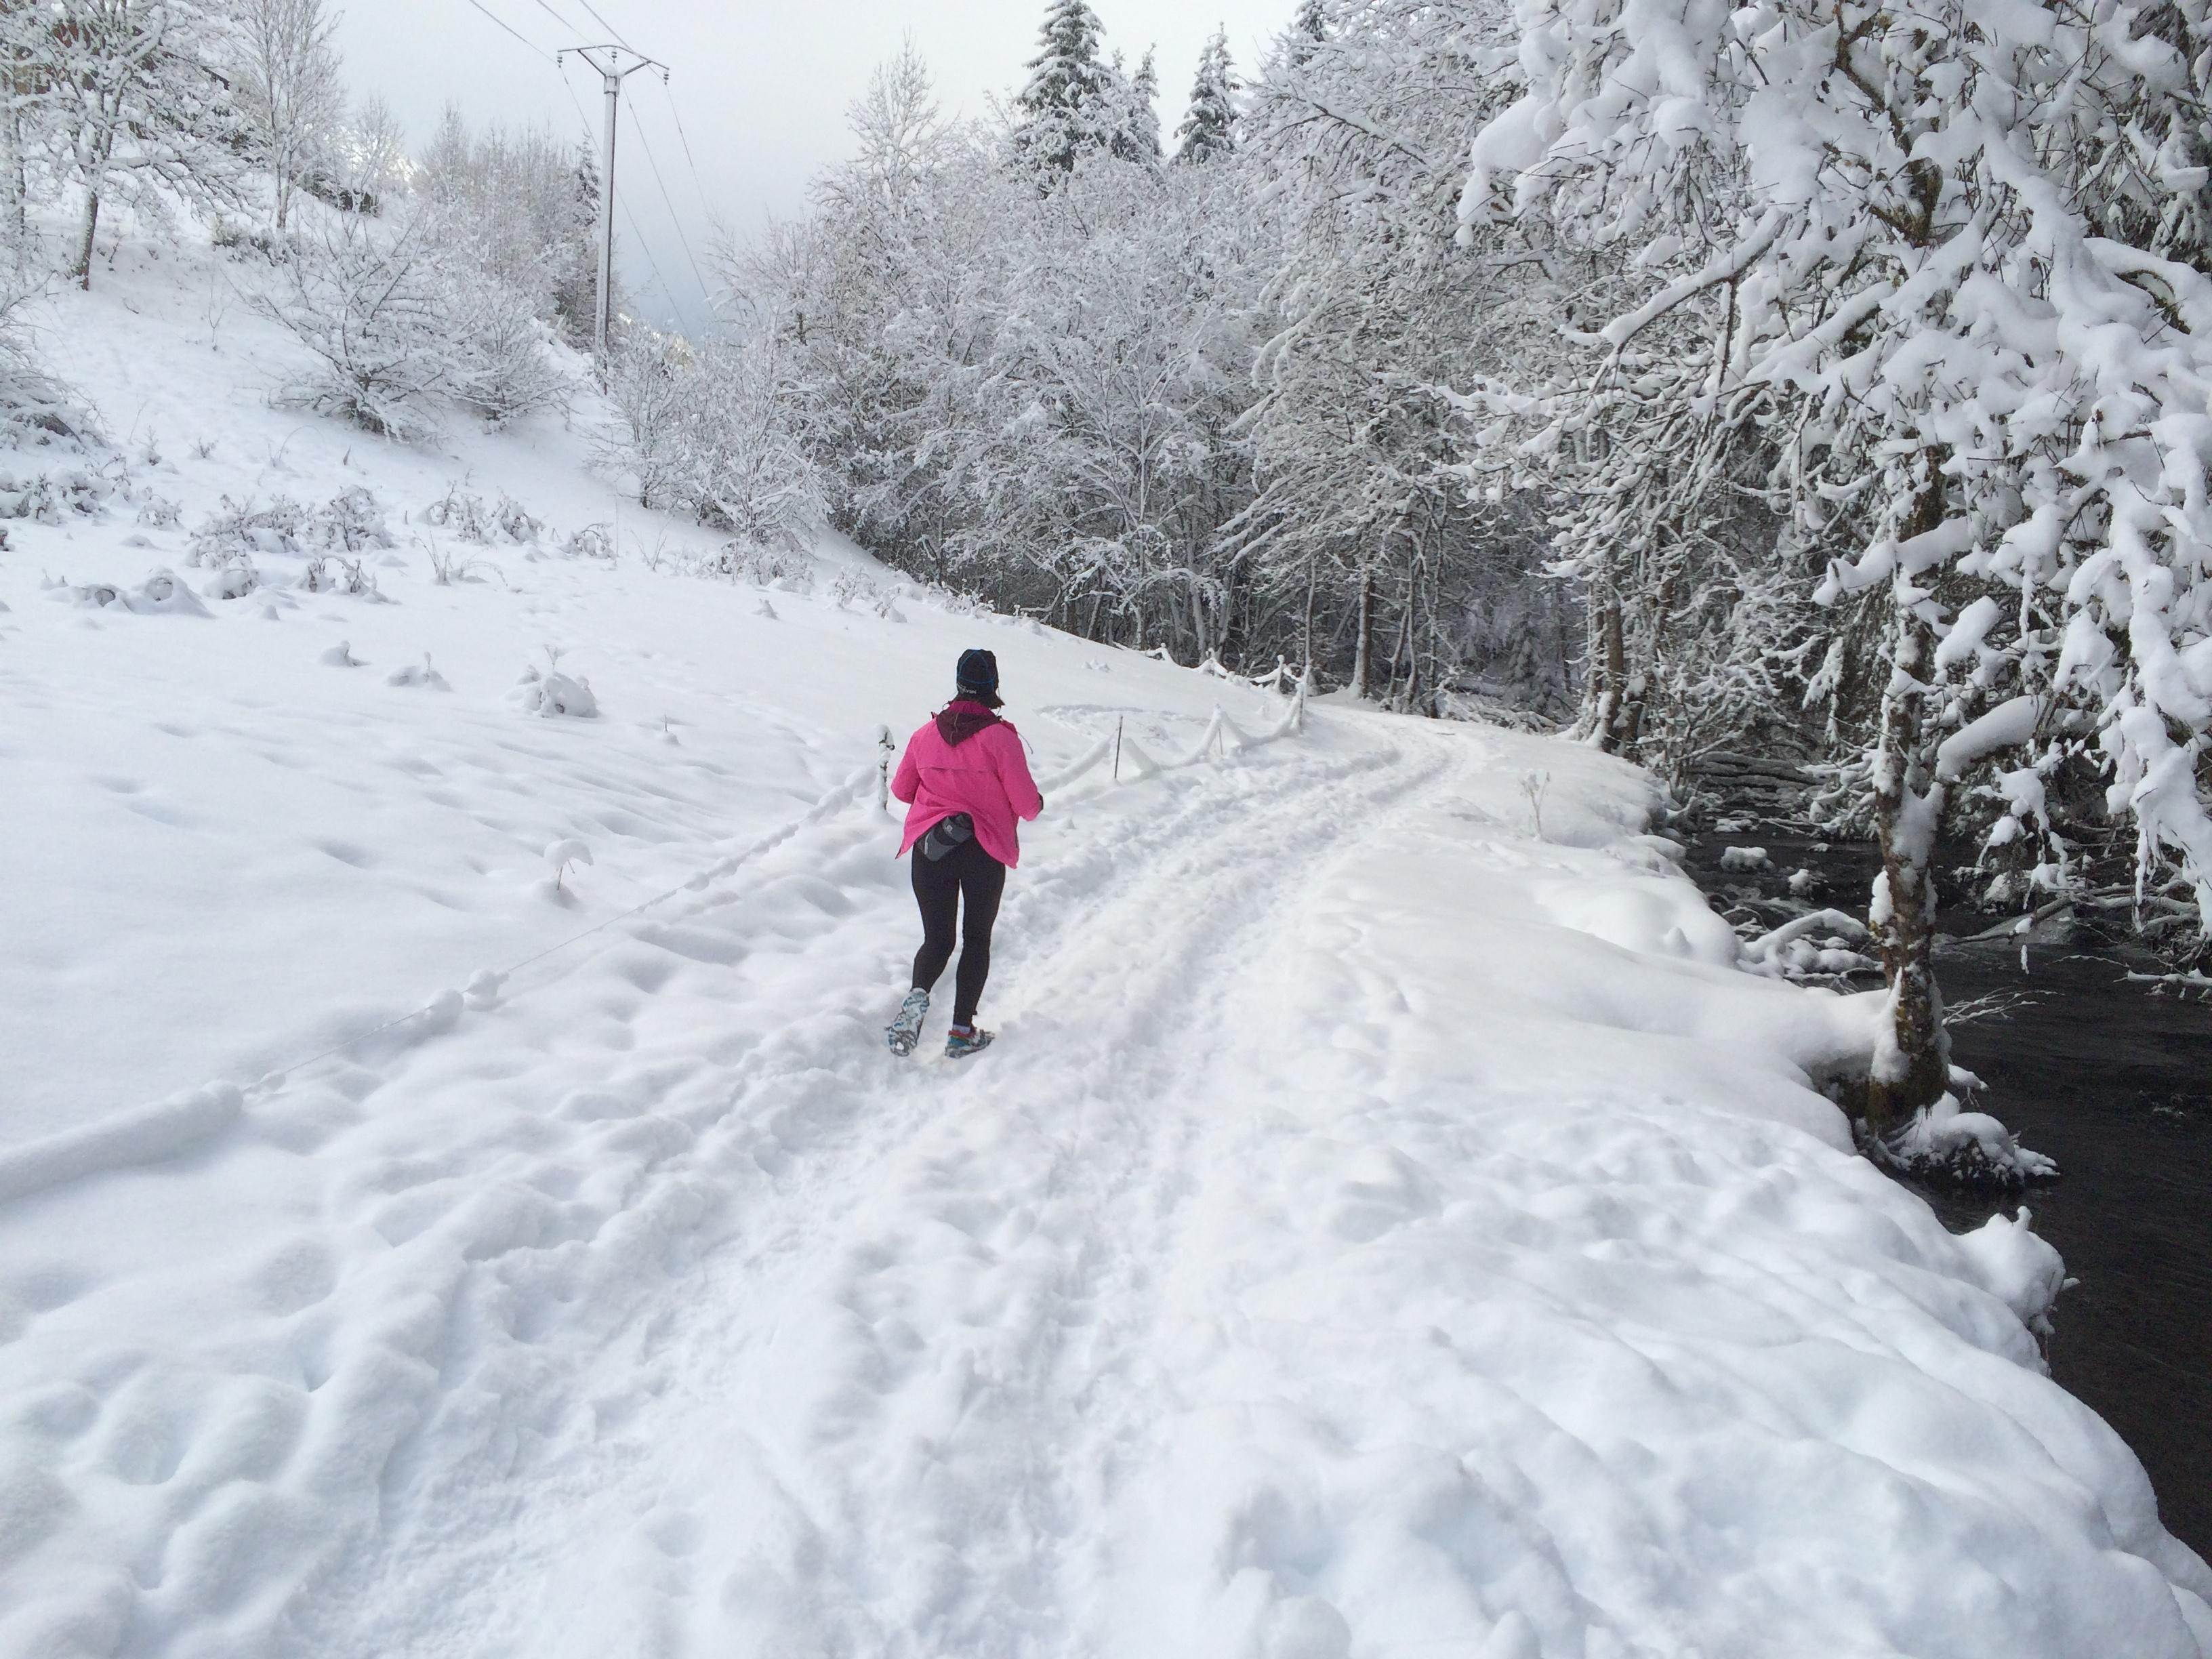 snow hellip god will be - photo #49